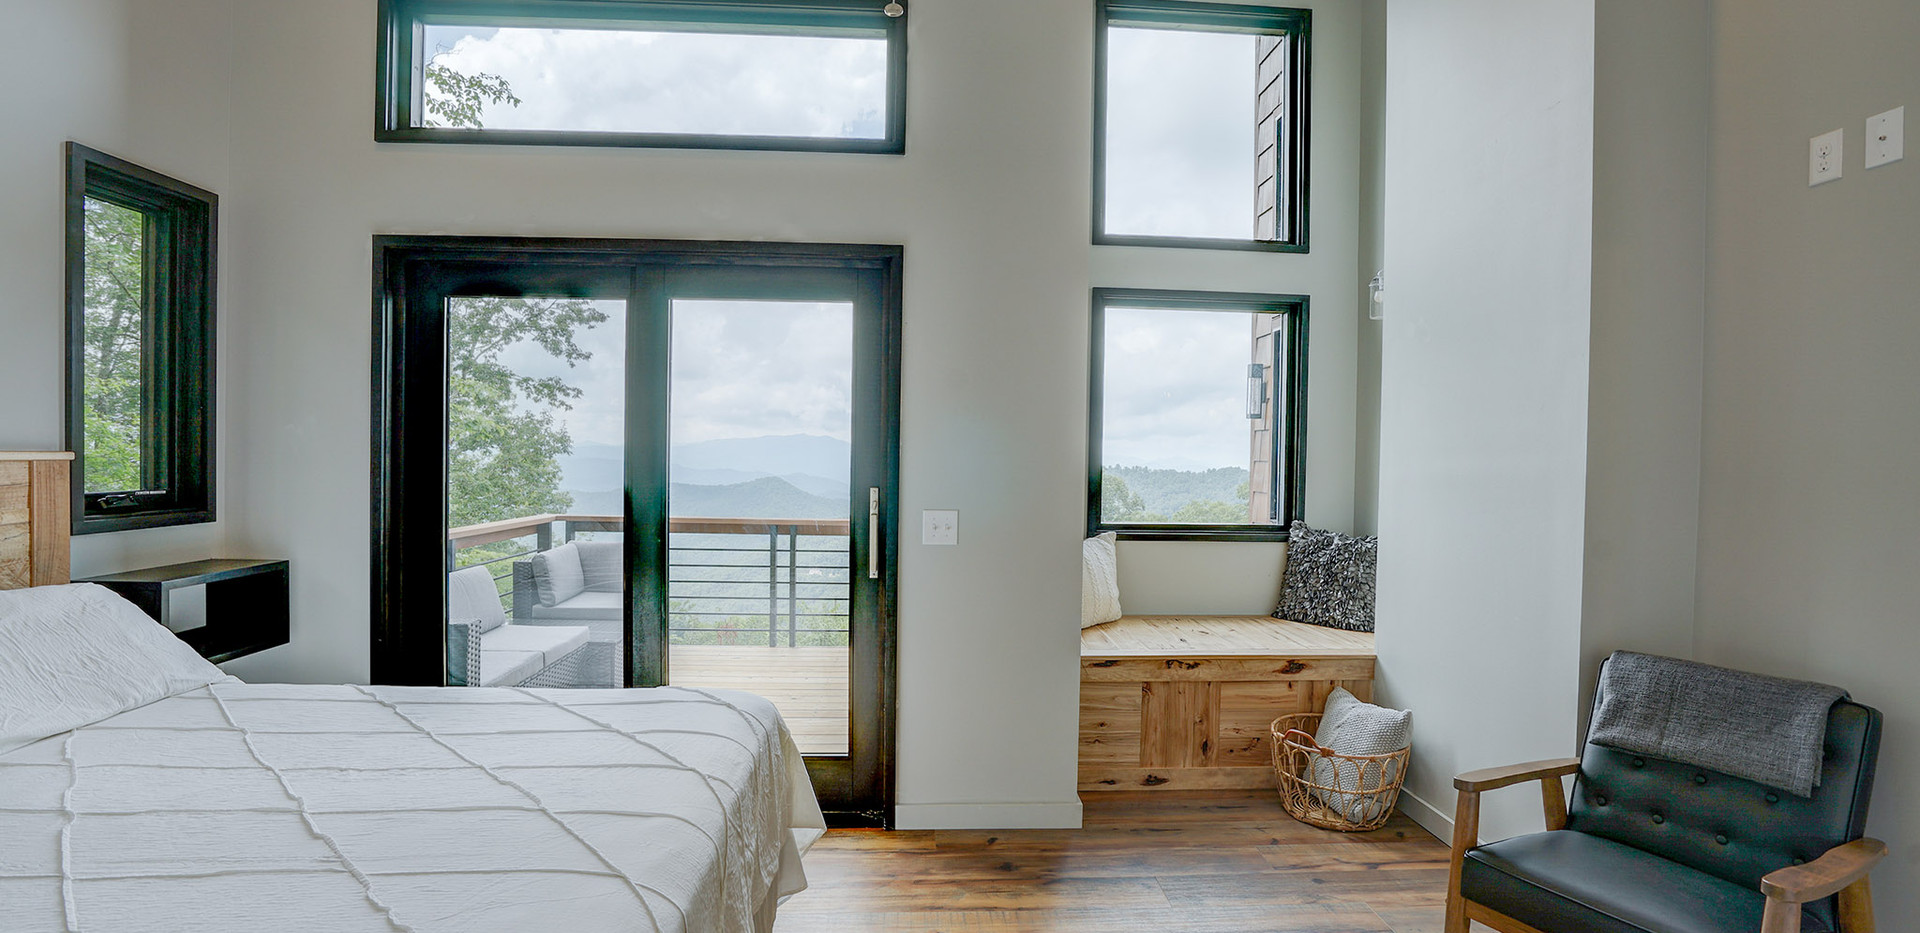 Sunset Falls - king master bedroom